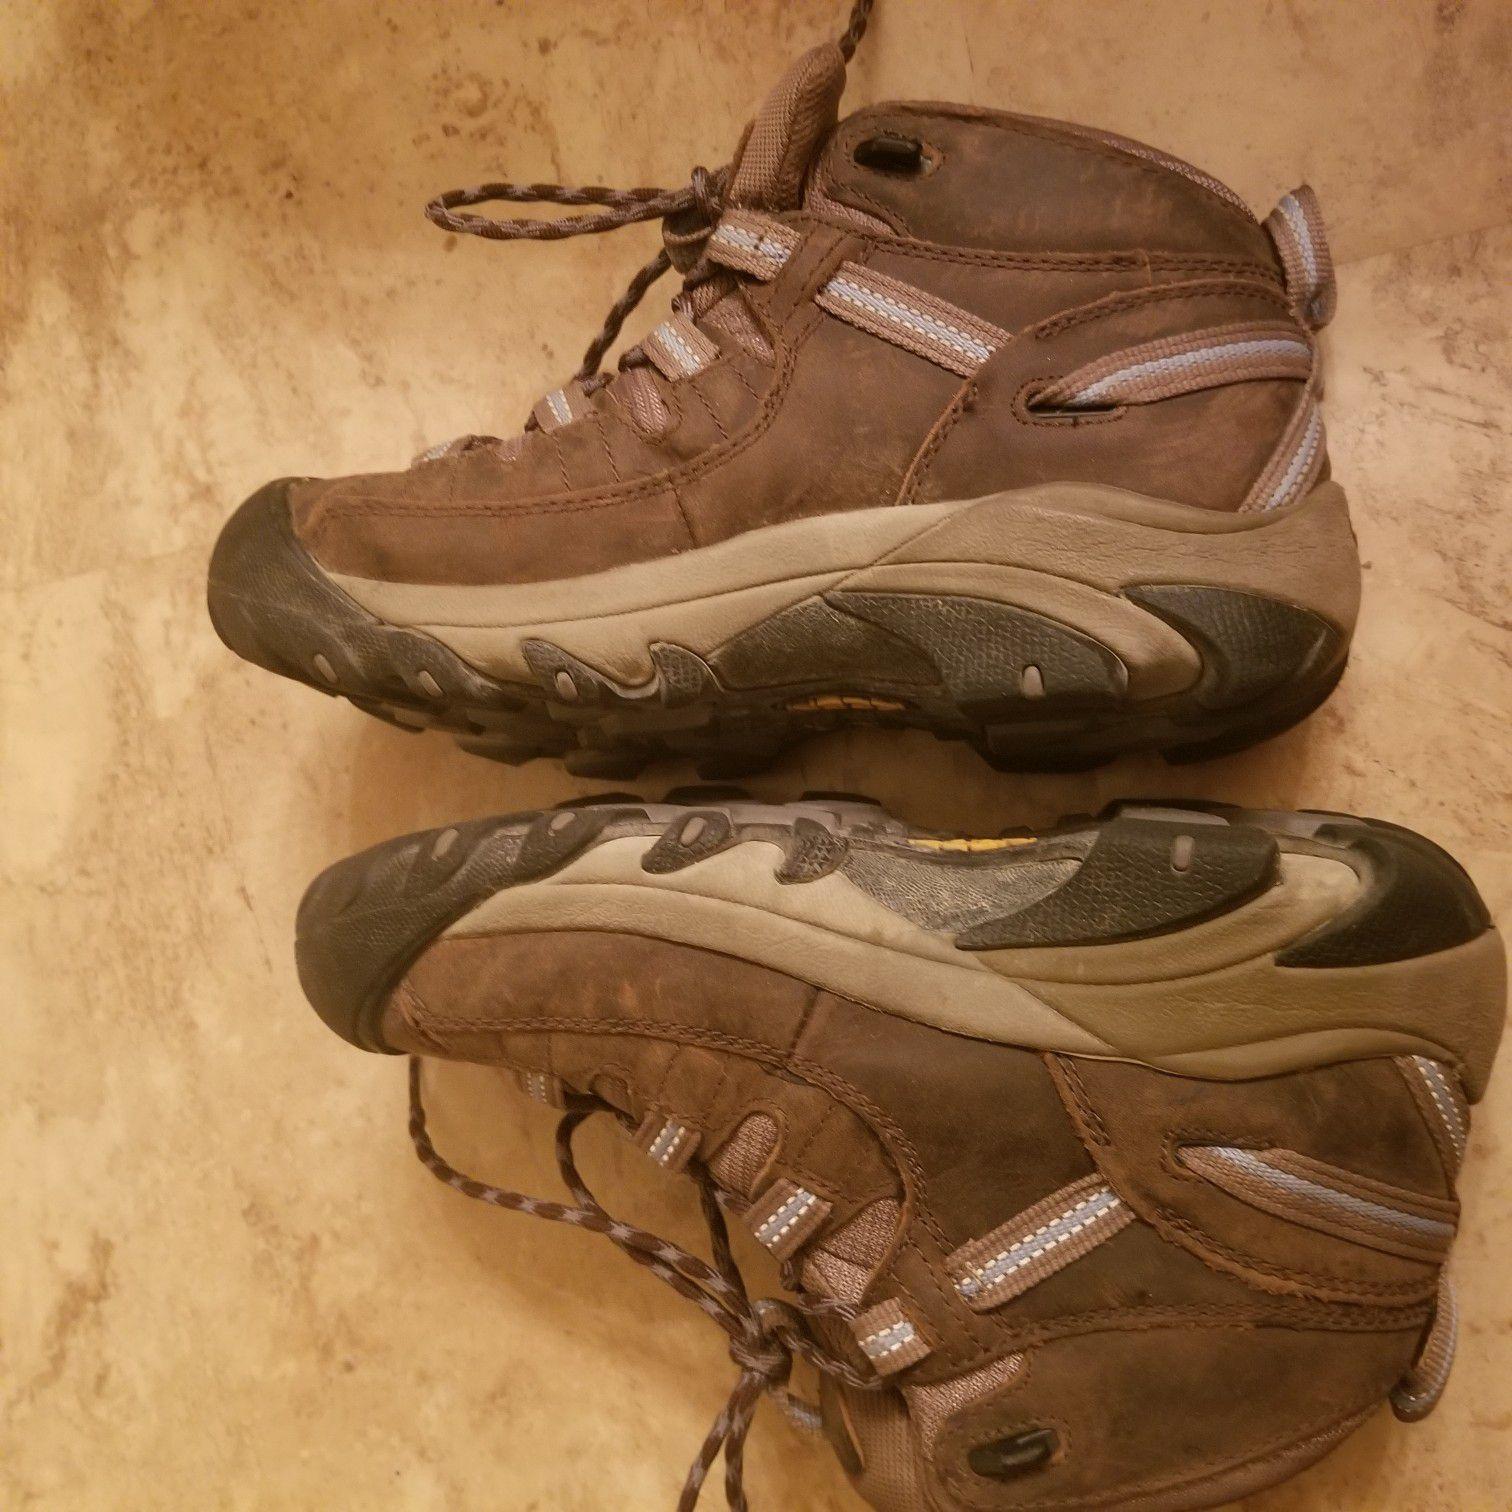 Keen womens hiking boots